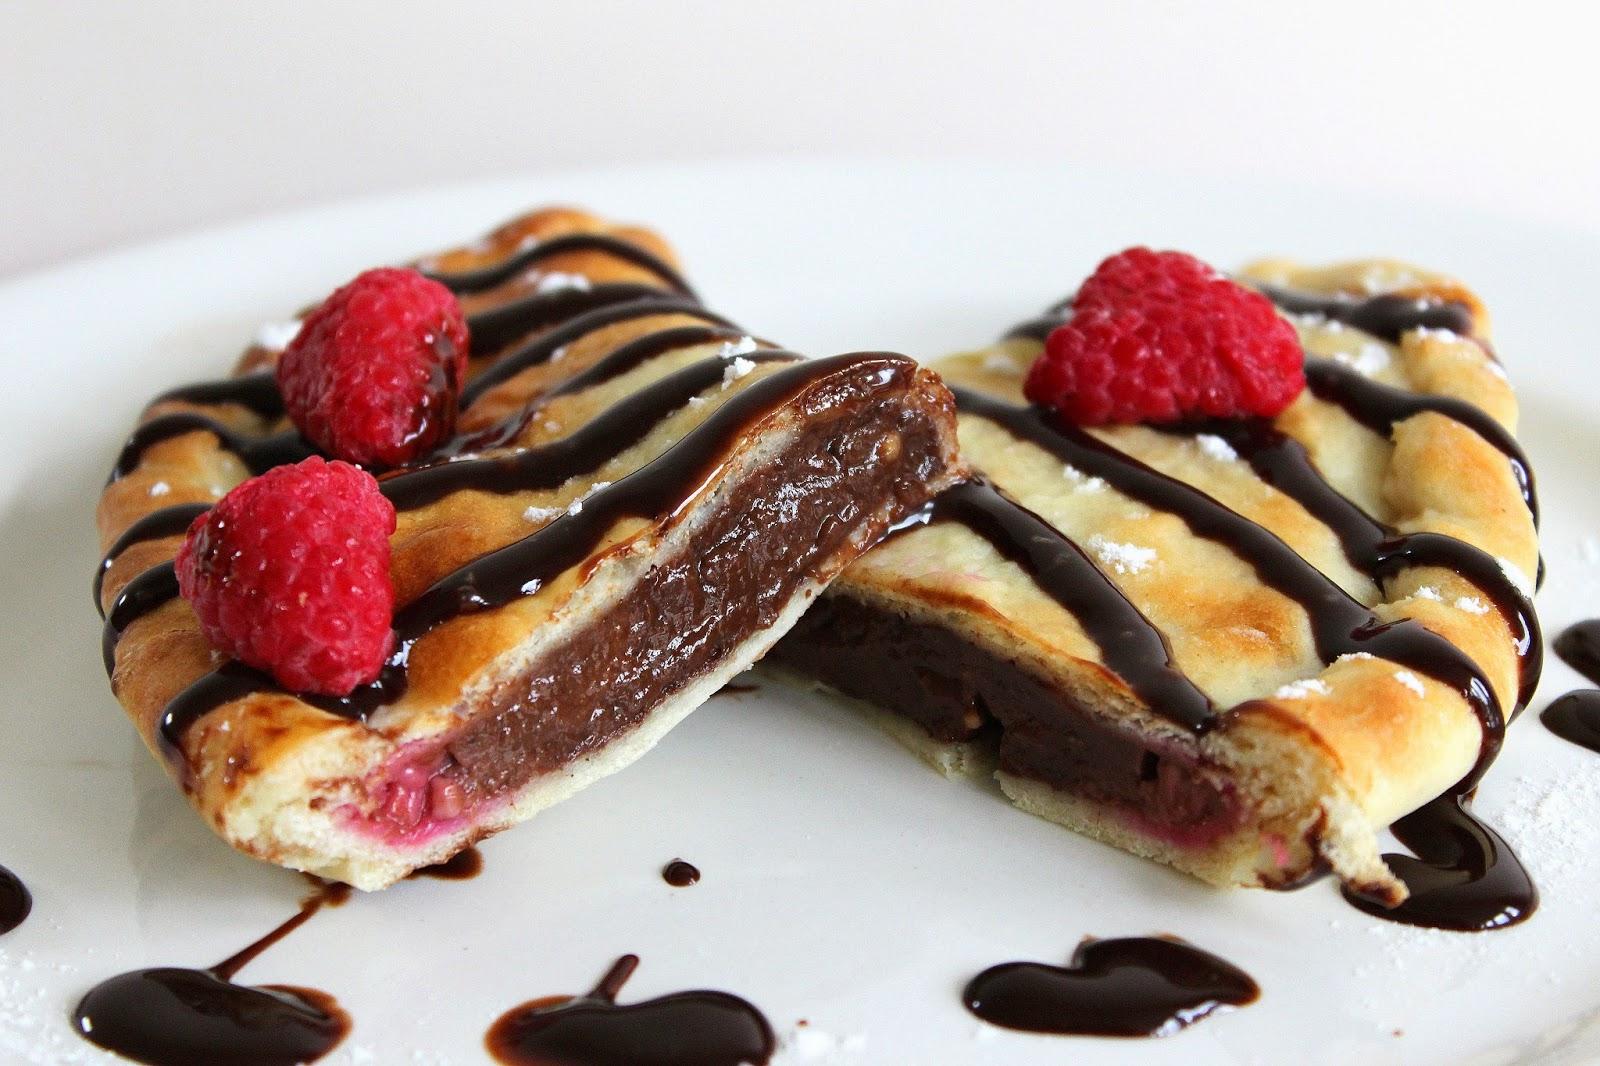 Picnic Chocolate And Raspberry Calzones